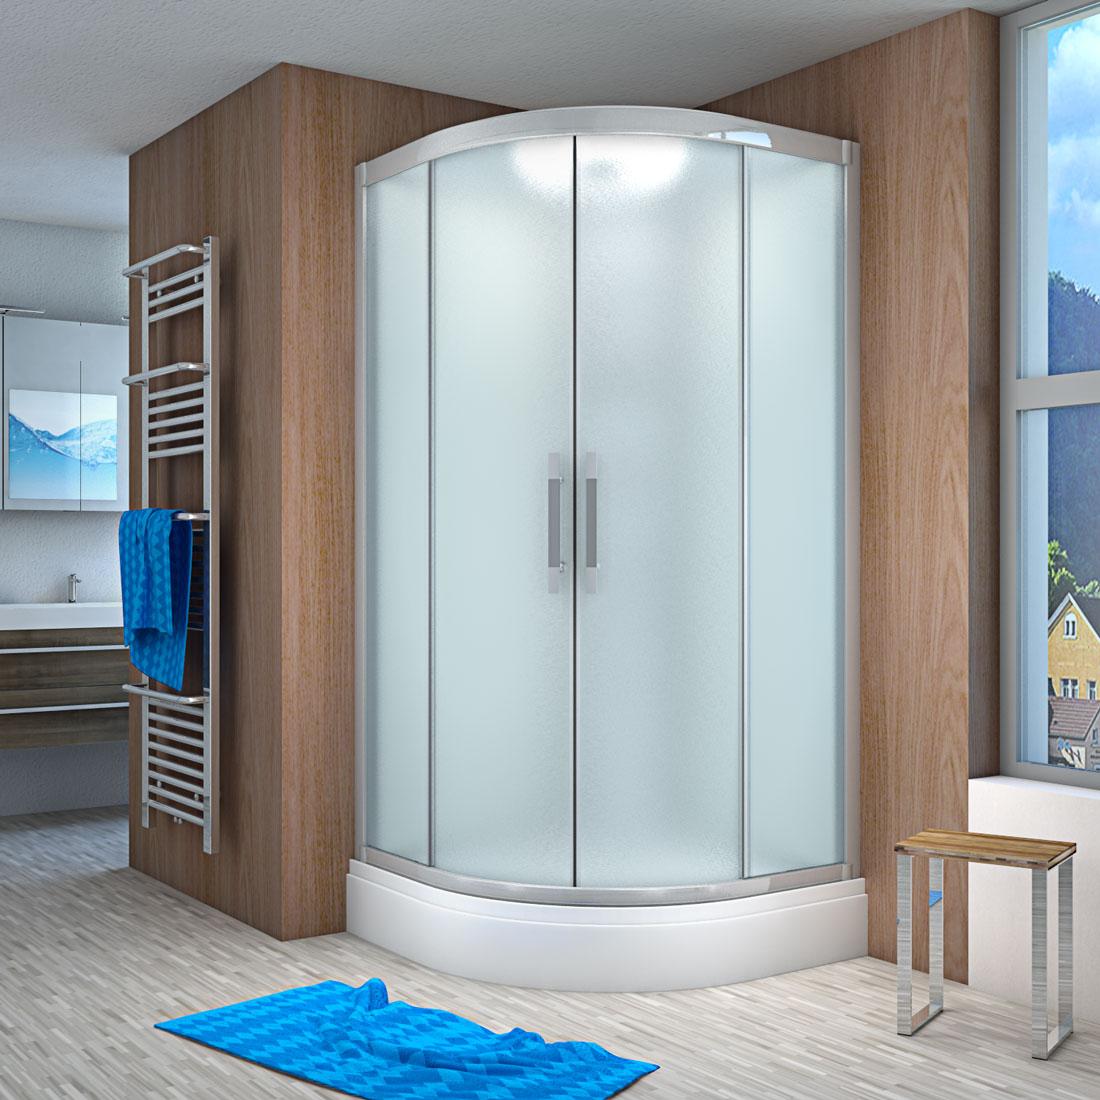 acquavapore quick26 1011 ws dusche 90x90cm. Black Bedroom Furniture Sets. Home Design Ideas